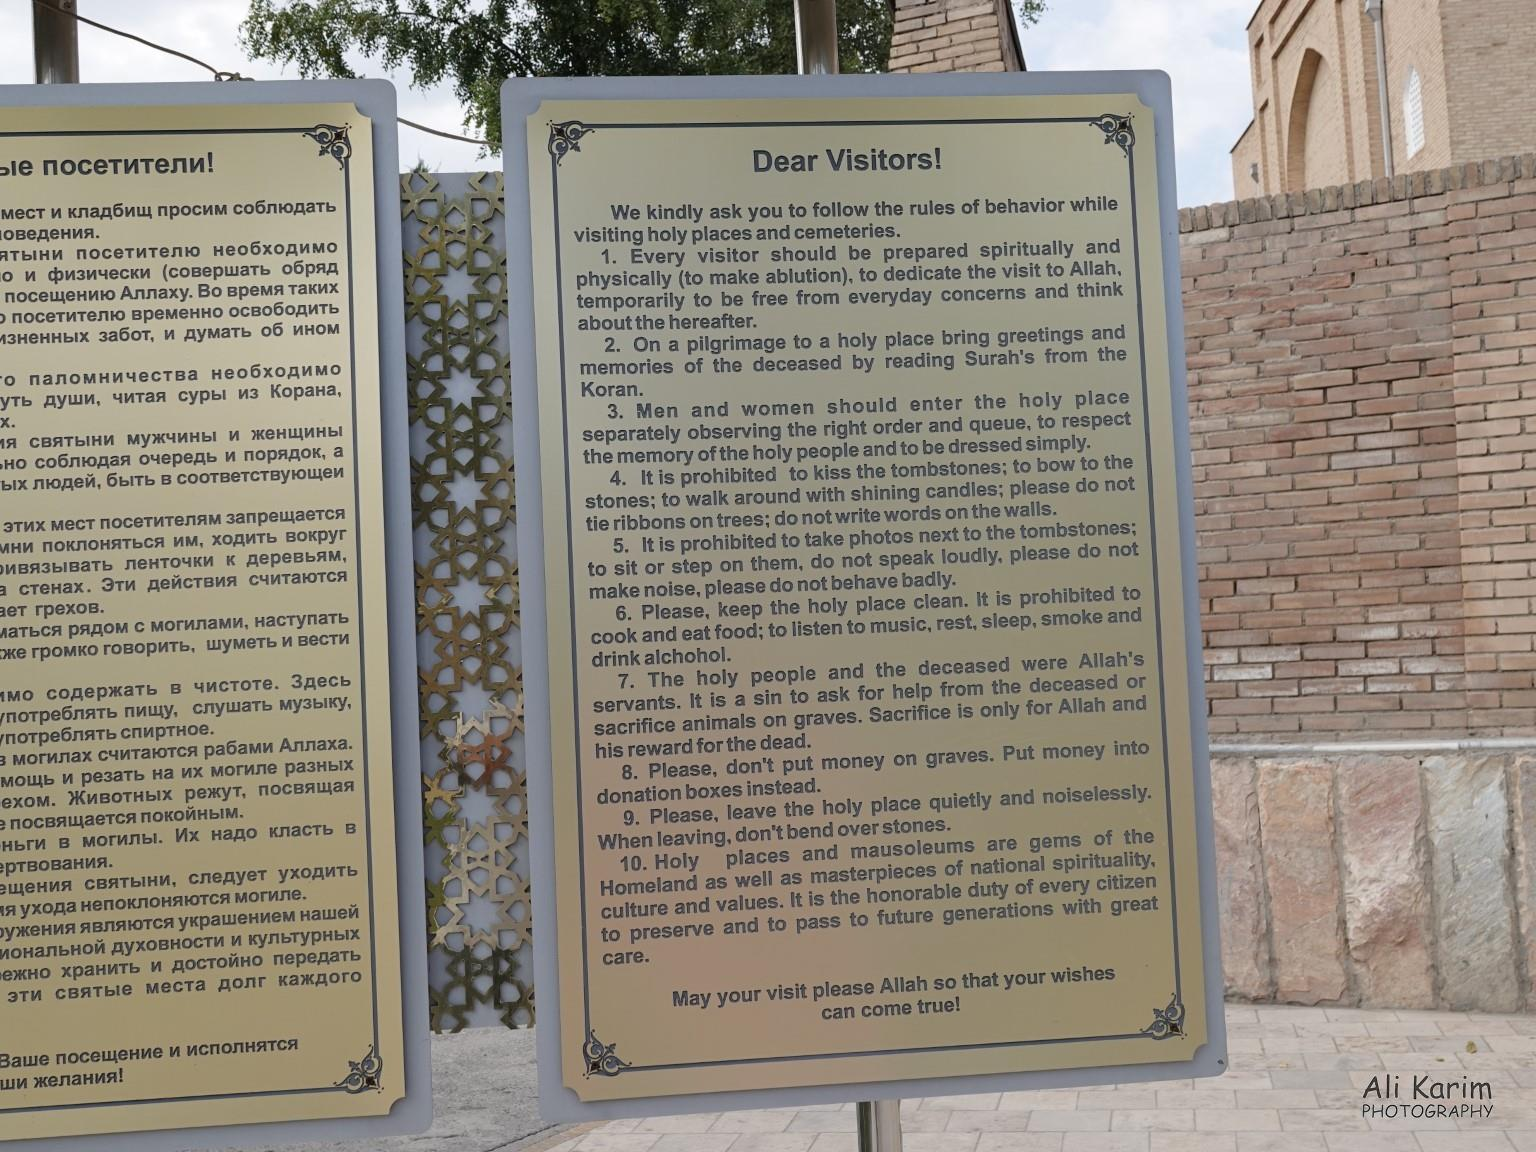 More Samarkand, Interesting instructions at Shah-i-zinda; I assume some of the nobility were holy people